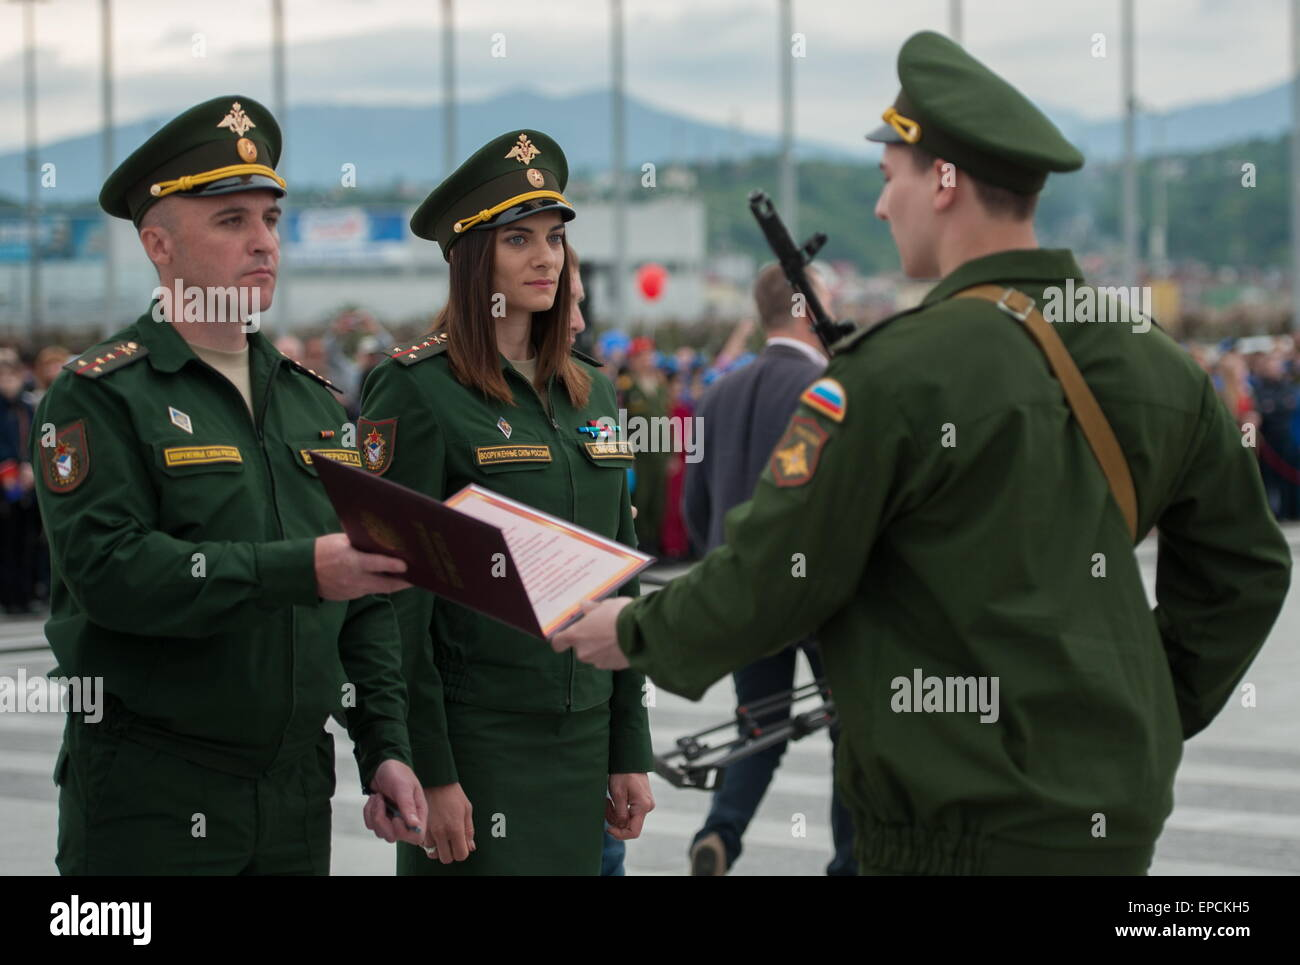 Elena Isinbayeva entered the military service under the contract 06.05.2015 72